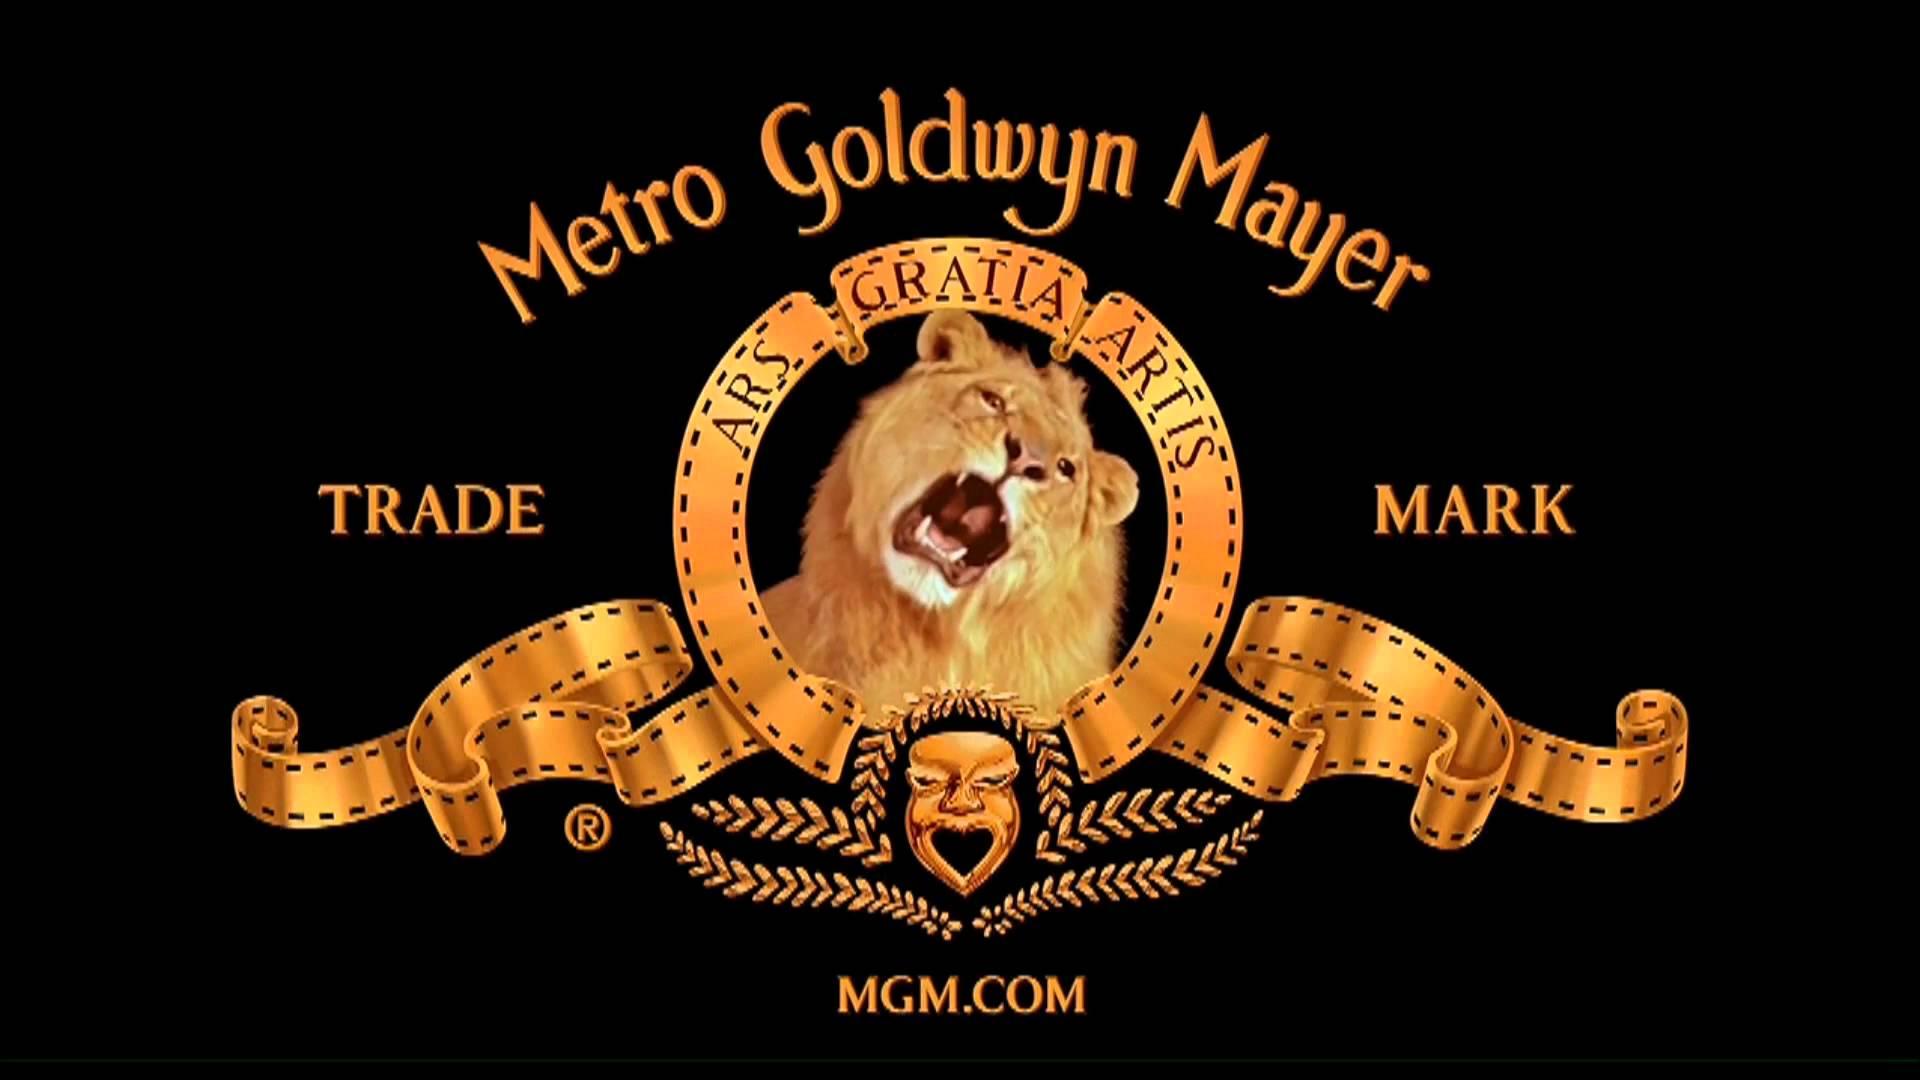 Gas-Tube: Lunga vita al leone della Metro Goldwyn Mayer